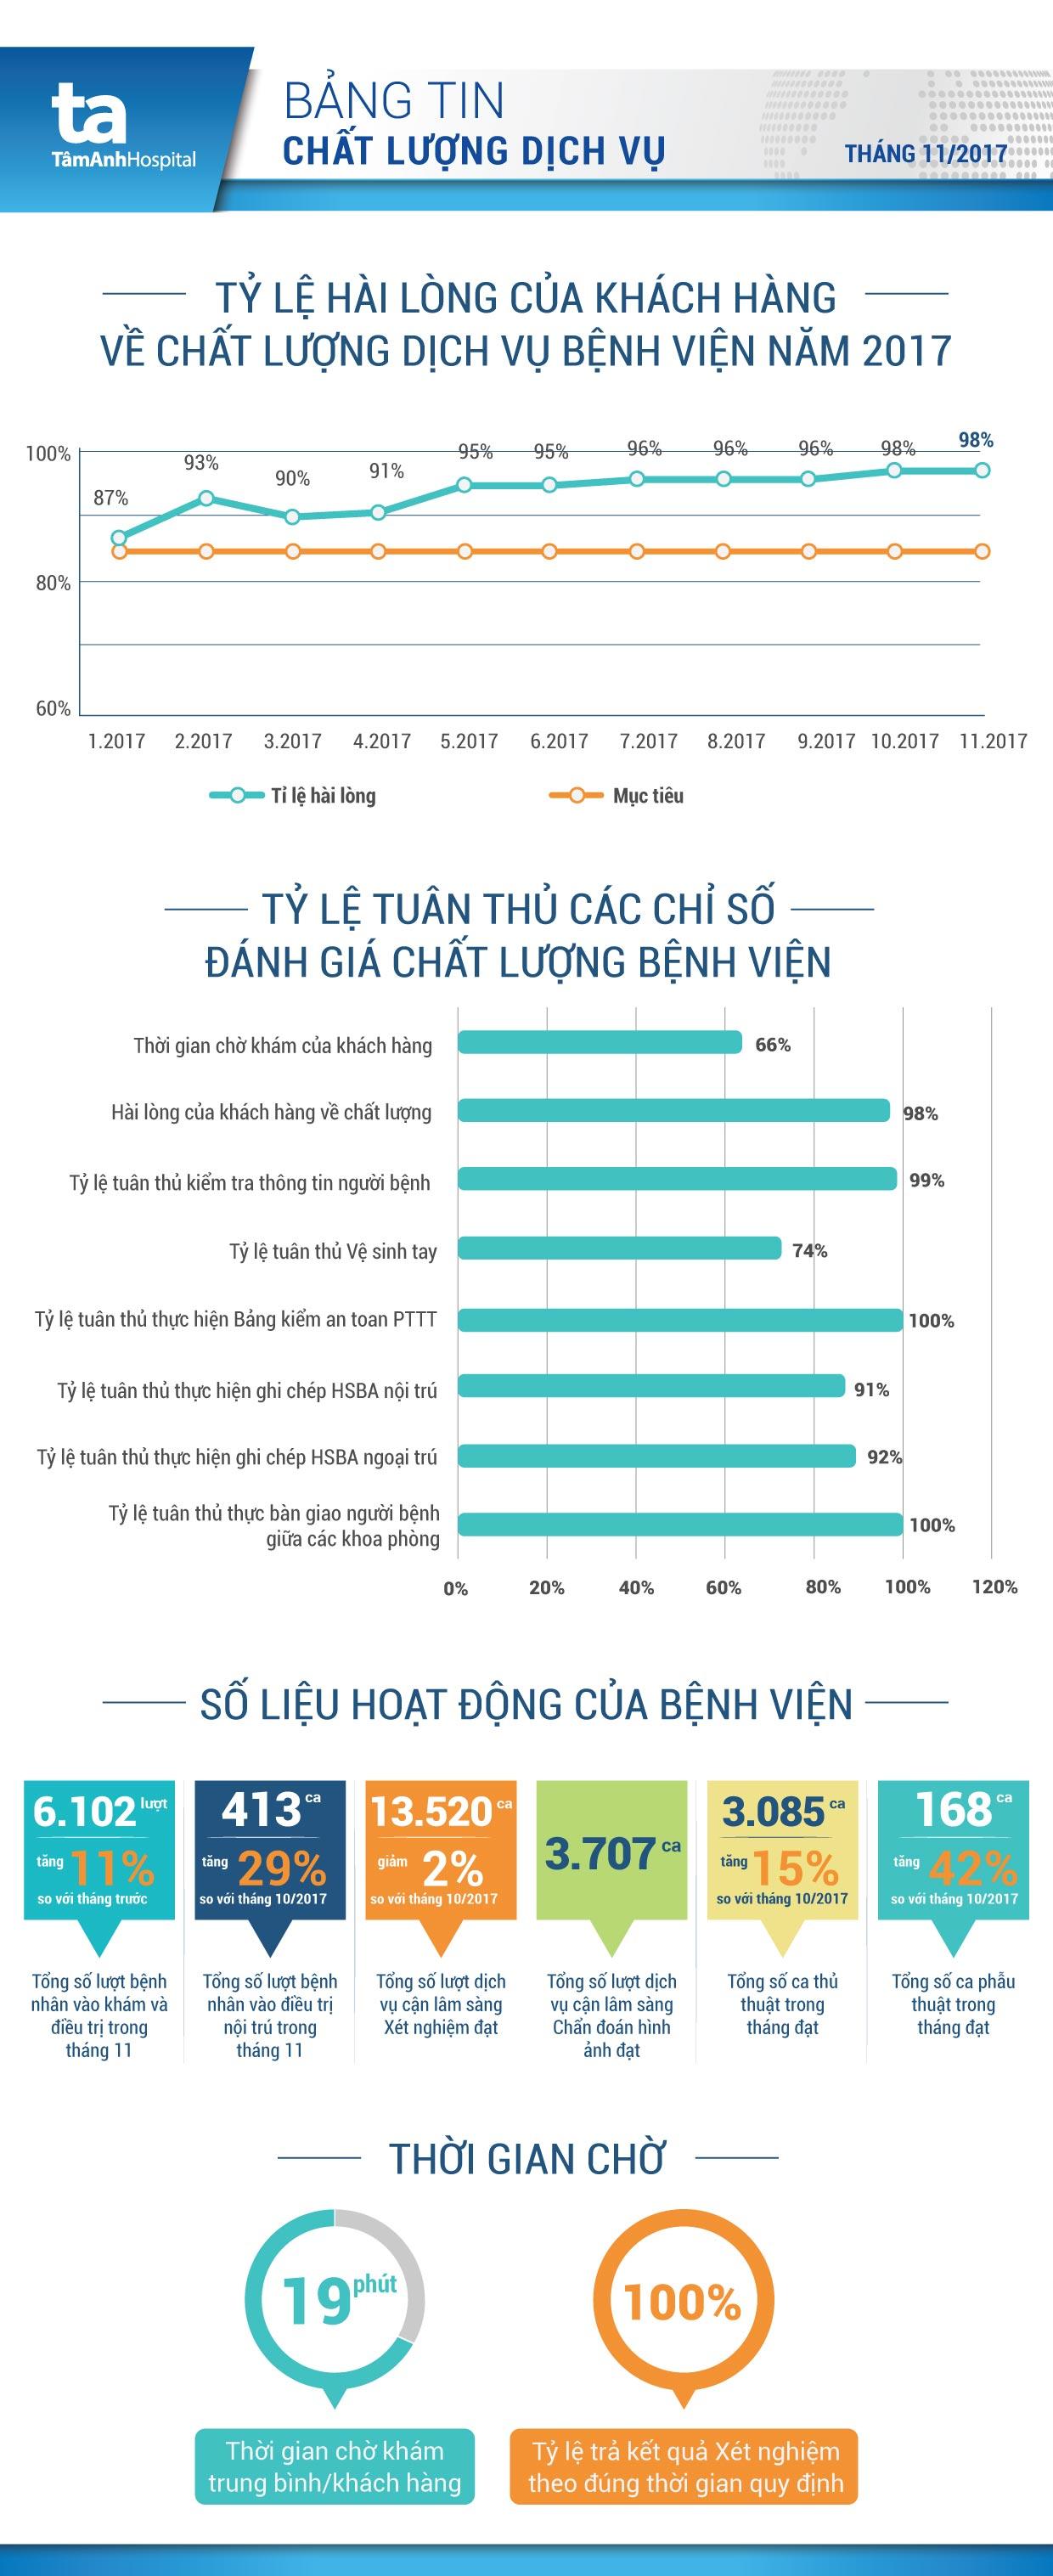 BVTA_BANTINCHATLUONG_Thang11-01